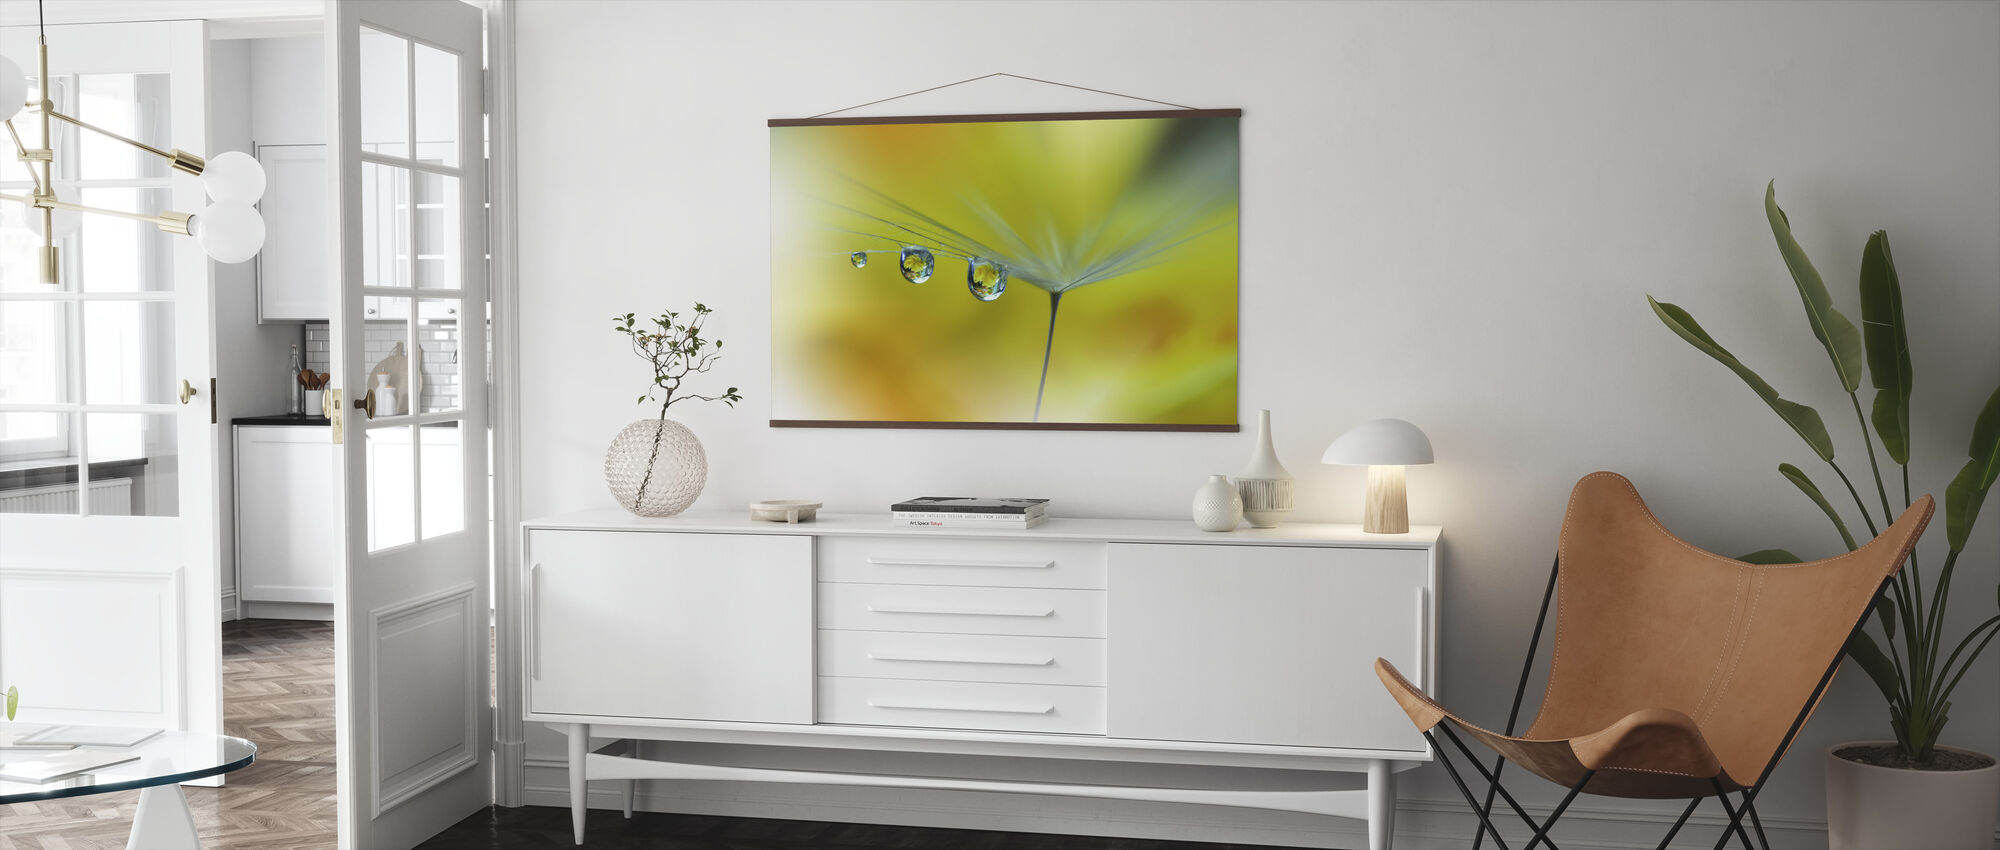 Sunbeam - Poster - Living Room